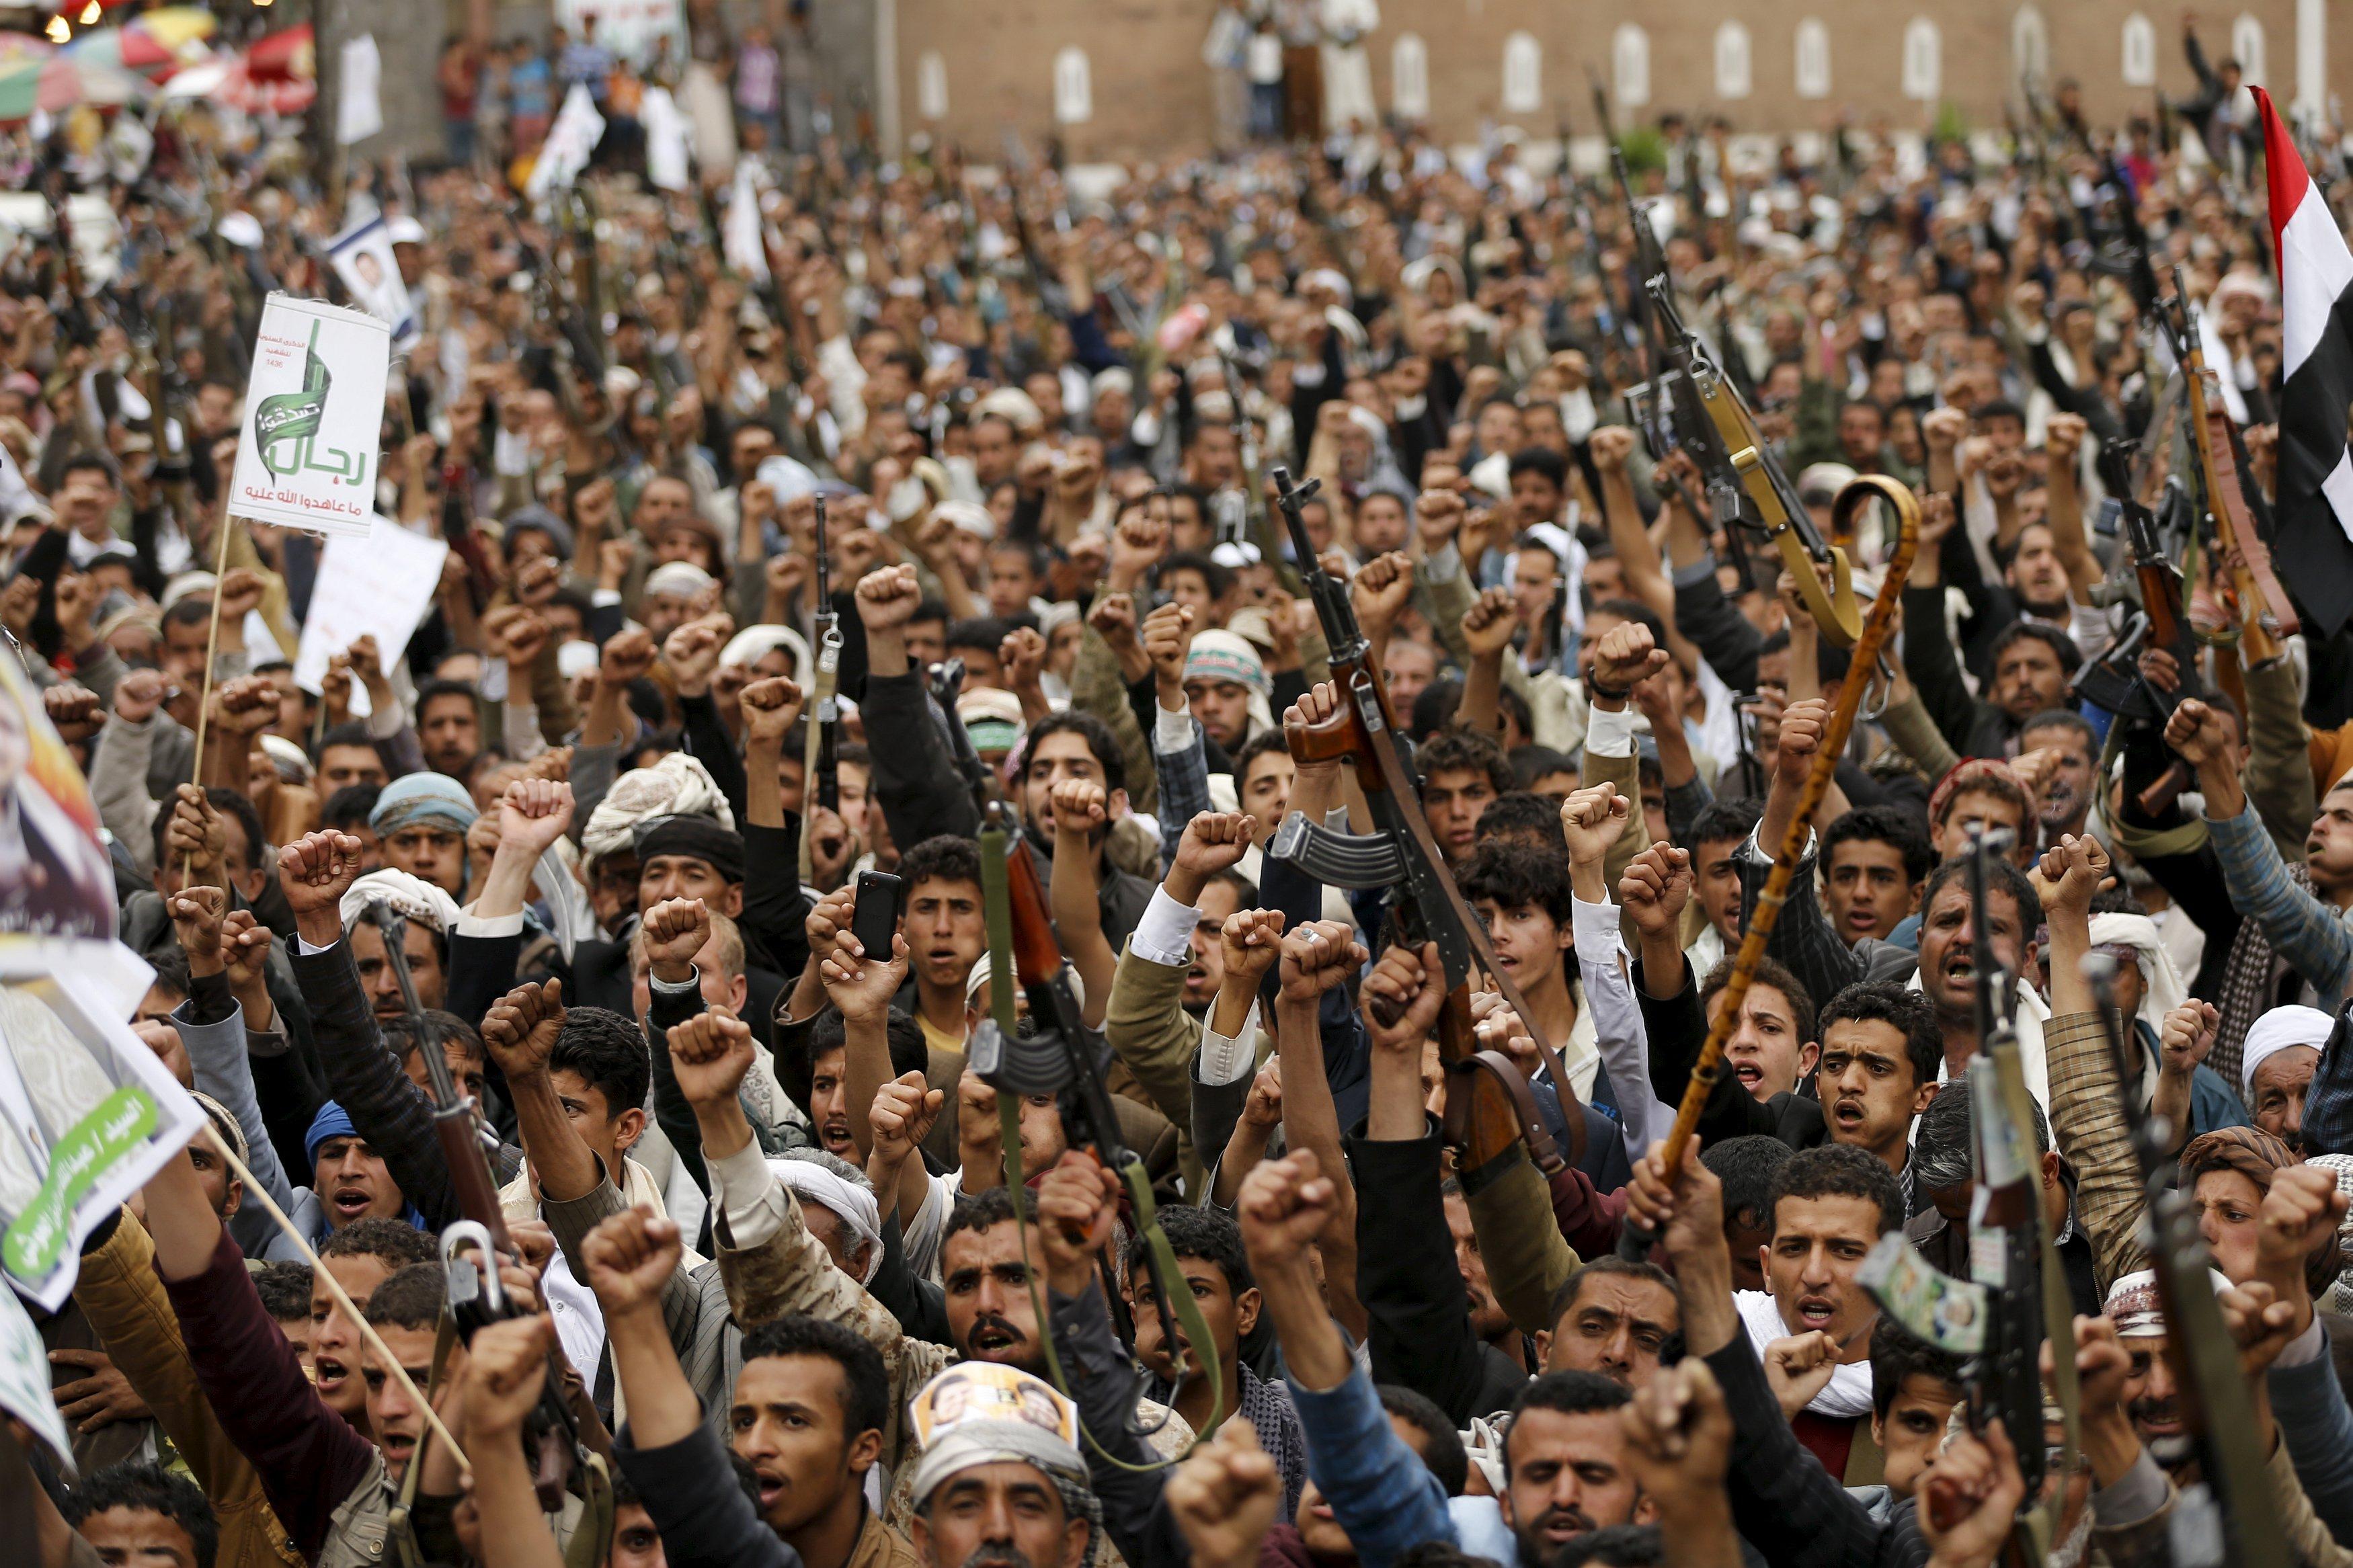 Yemen-conflict-Red-Cross-calls-for-truce